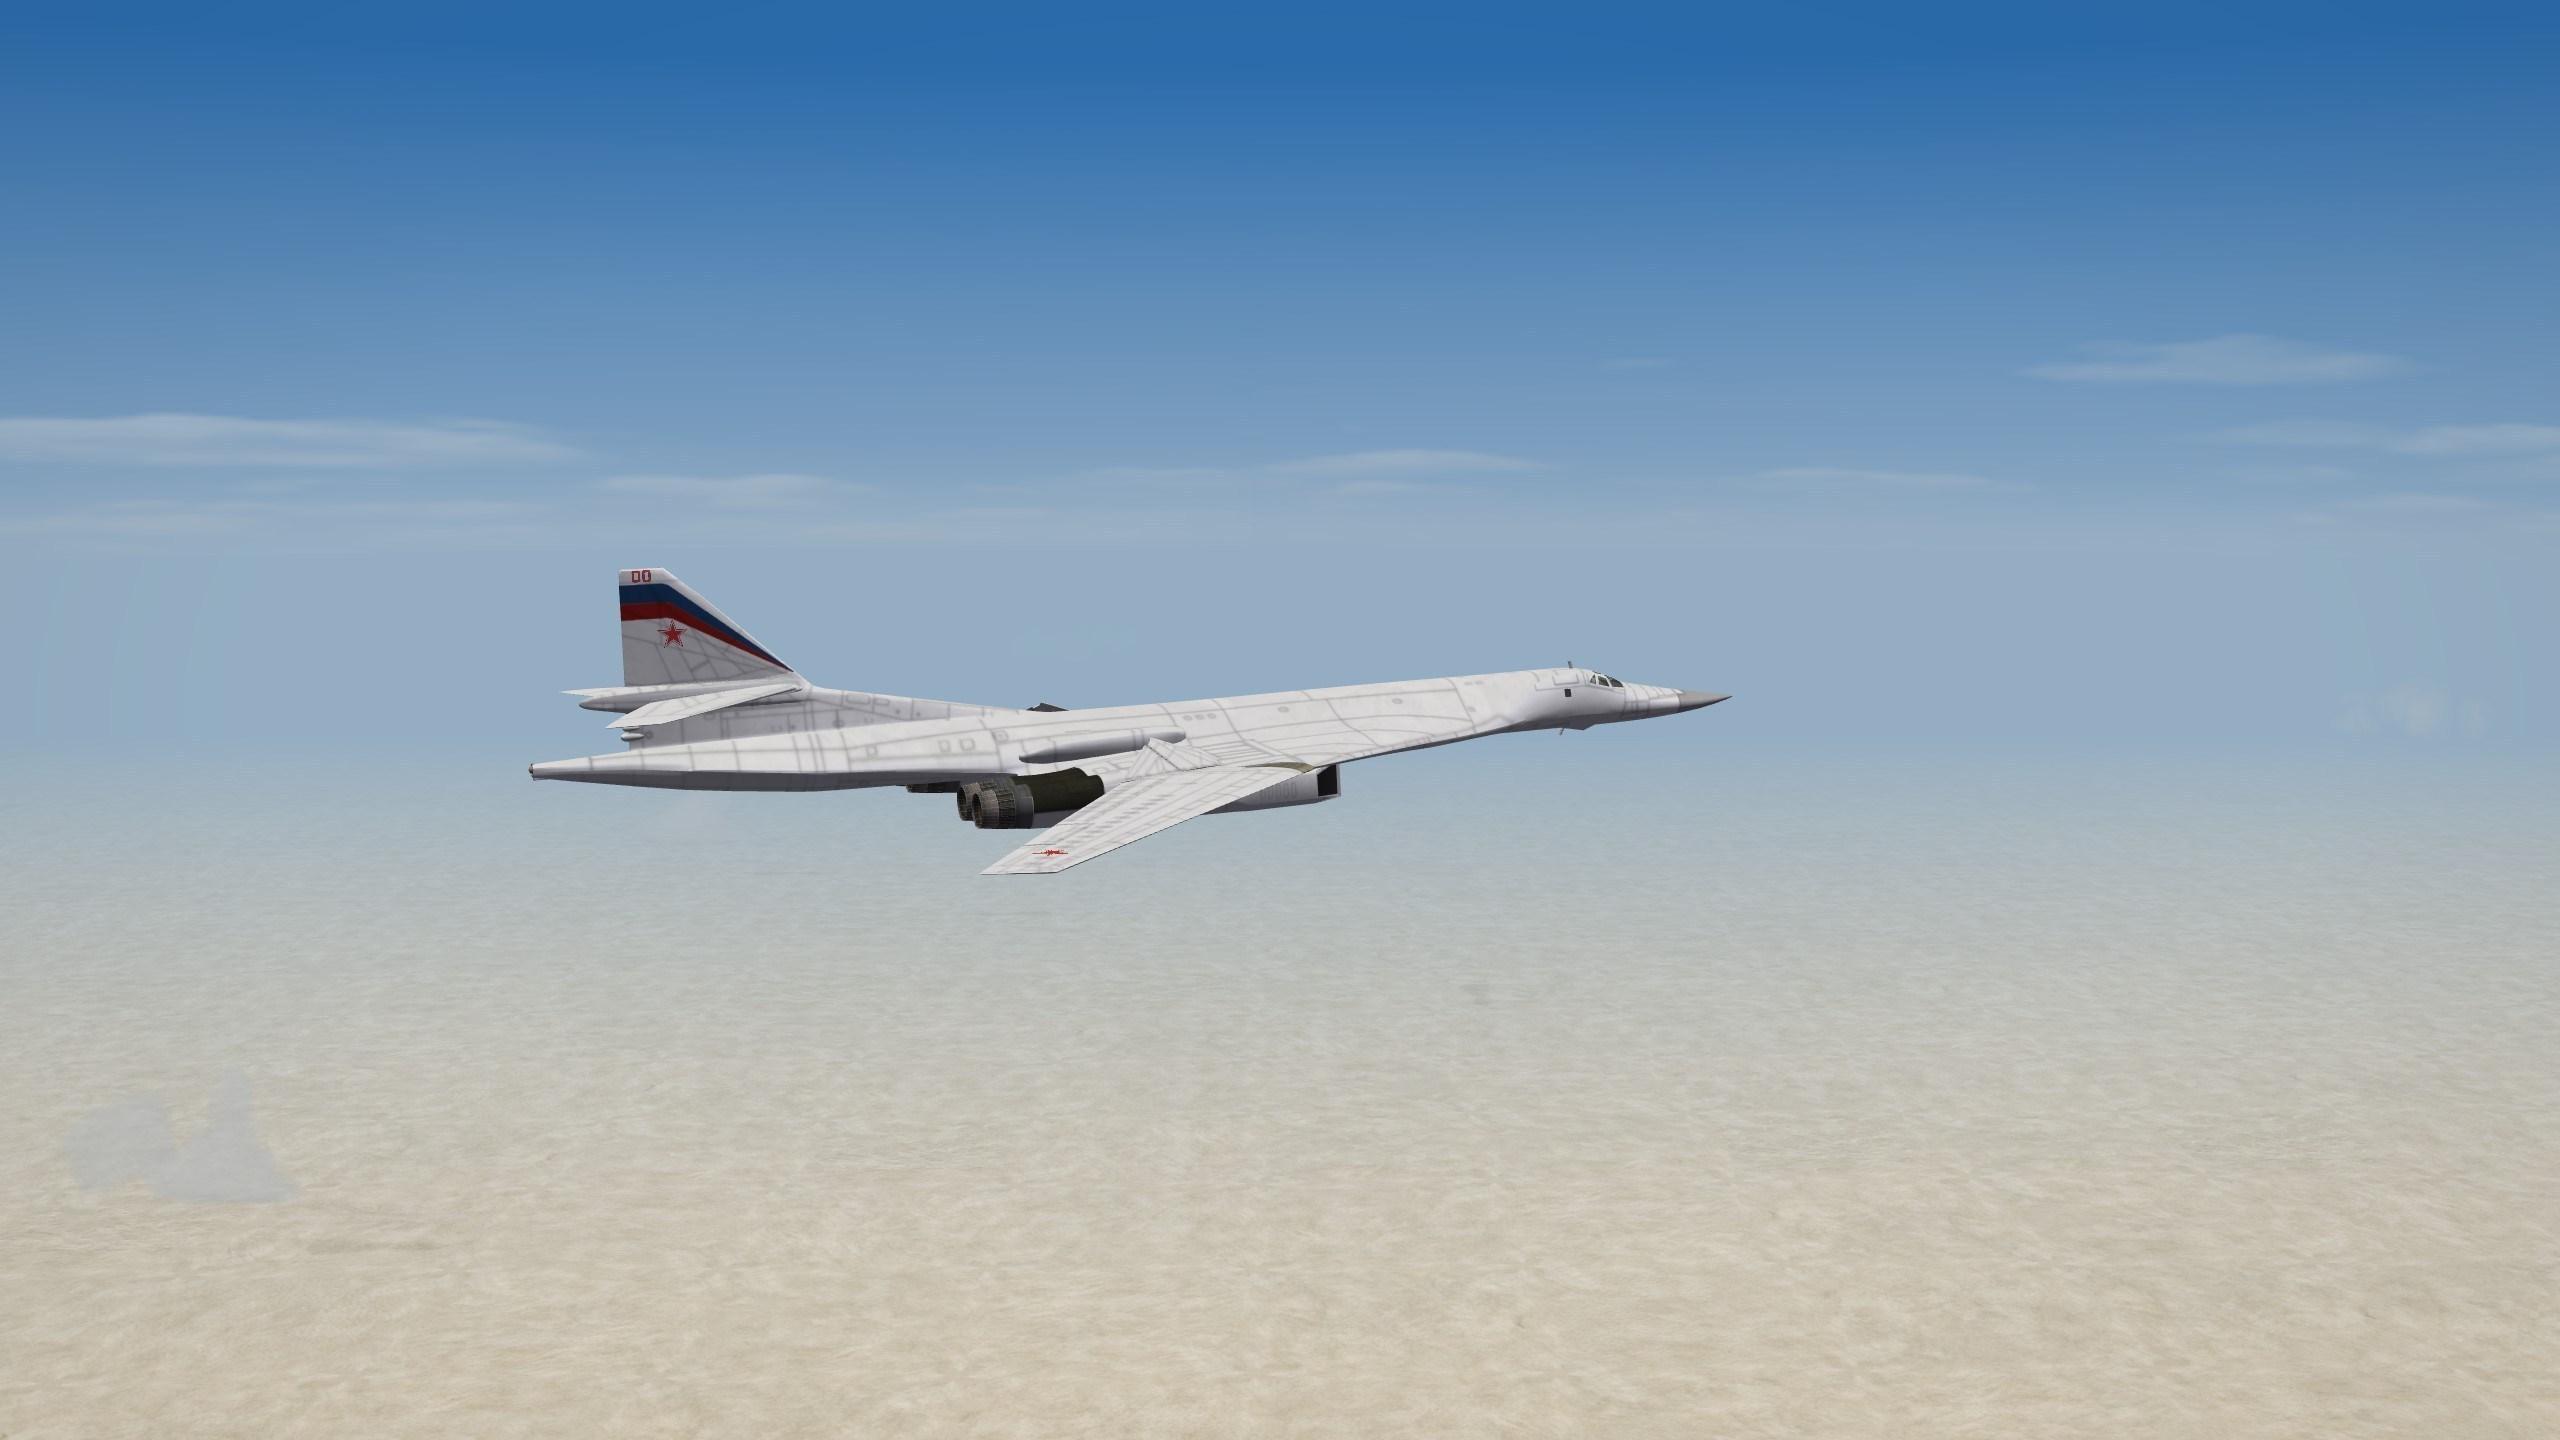 TU-160 Blackjack  - Cold War version for SF2 1.0.0 by UllyB